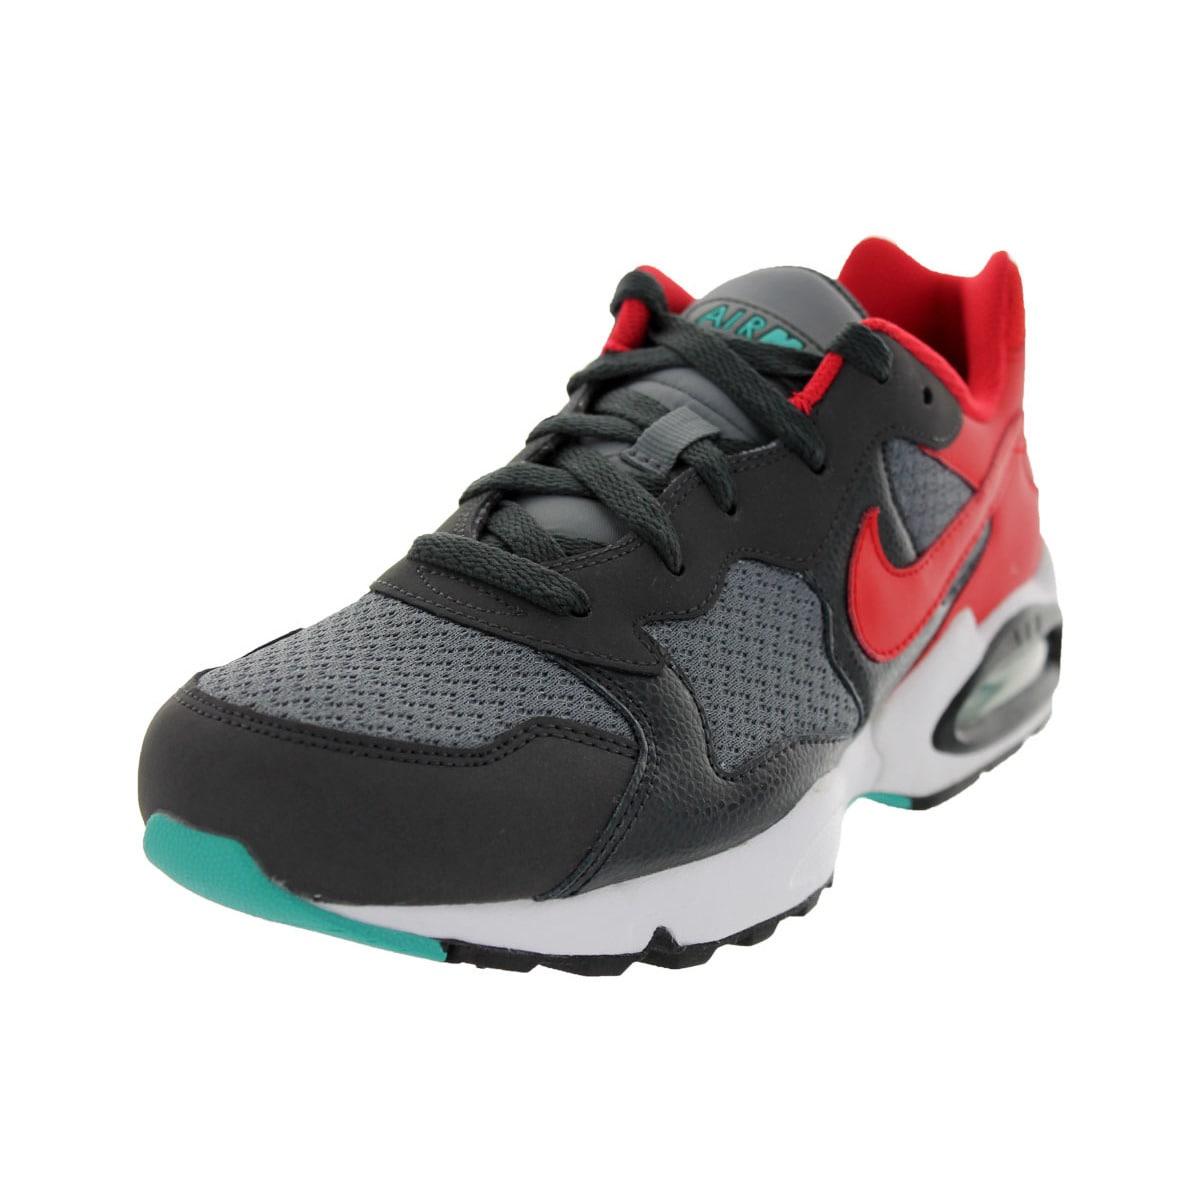 Nike Men's Air Max Triax '94 Grey/Red Running Shoe